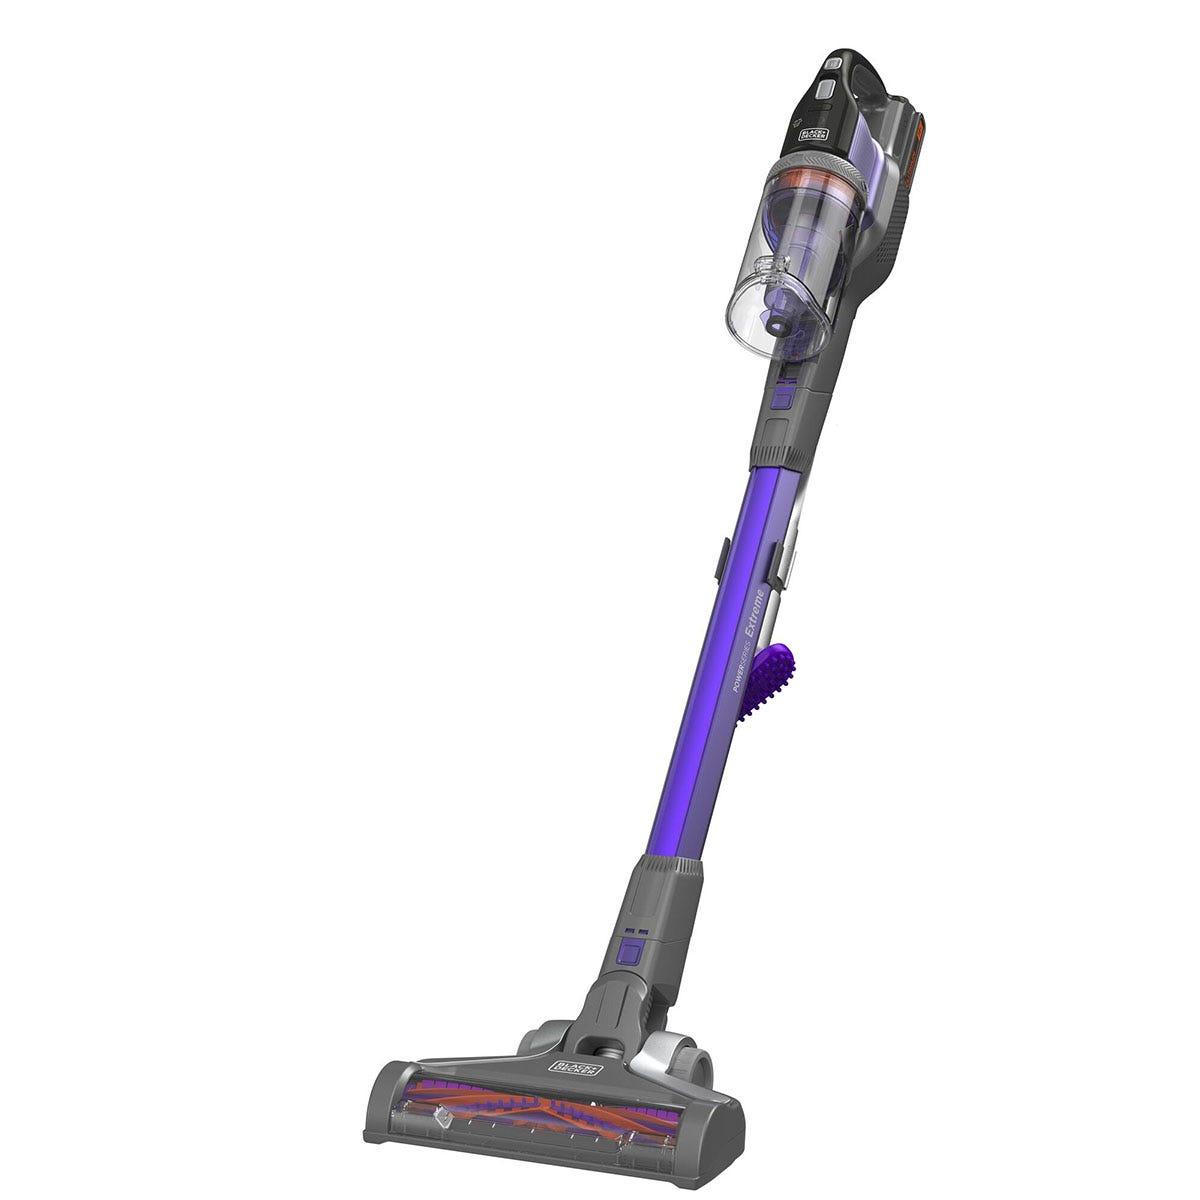 Black & Decker BHFEV182B-XJ PowerSeries Floor Extension Cordless Stick Vacuum Cleaner - Grey